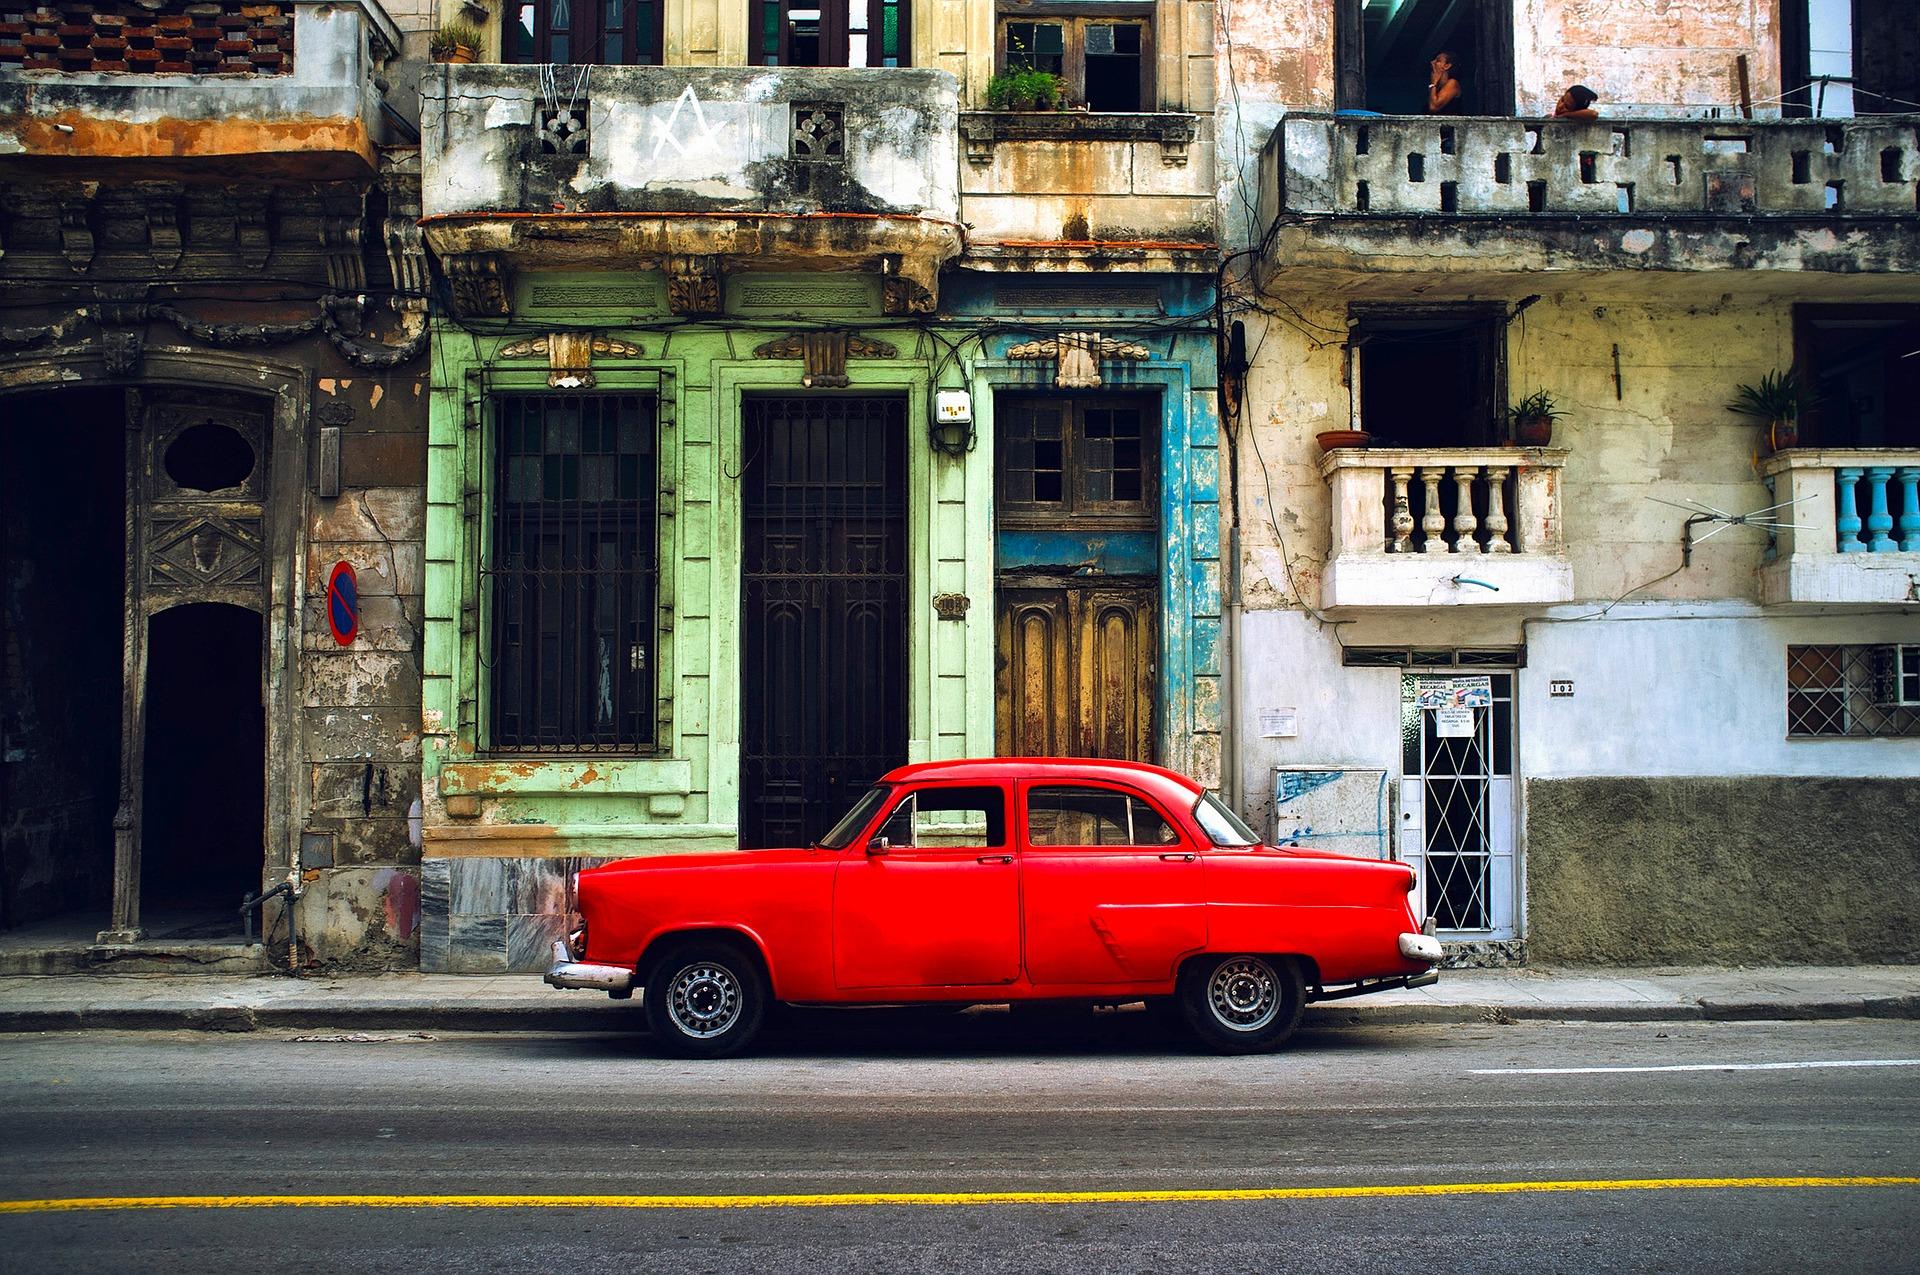 Streets of Cuba | © David Mark